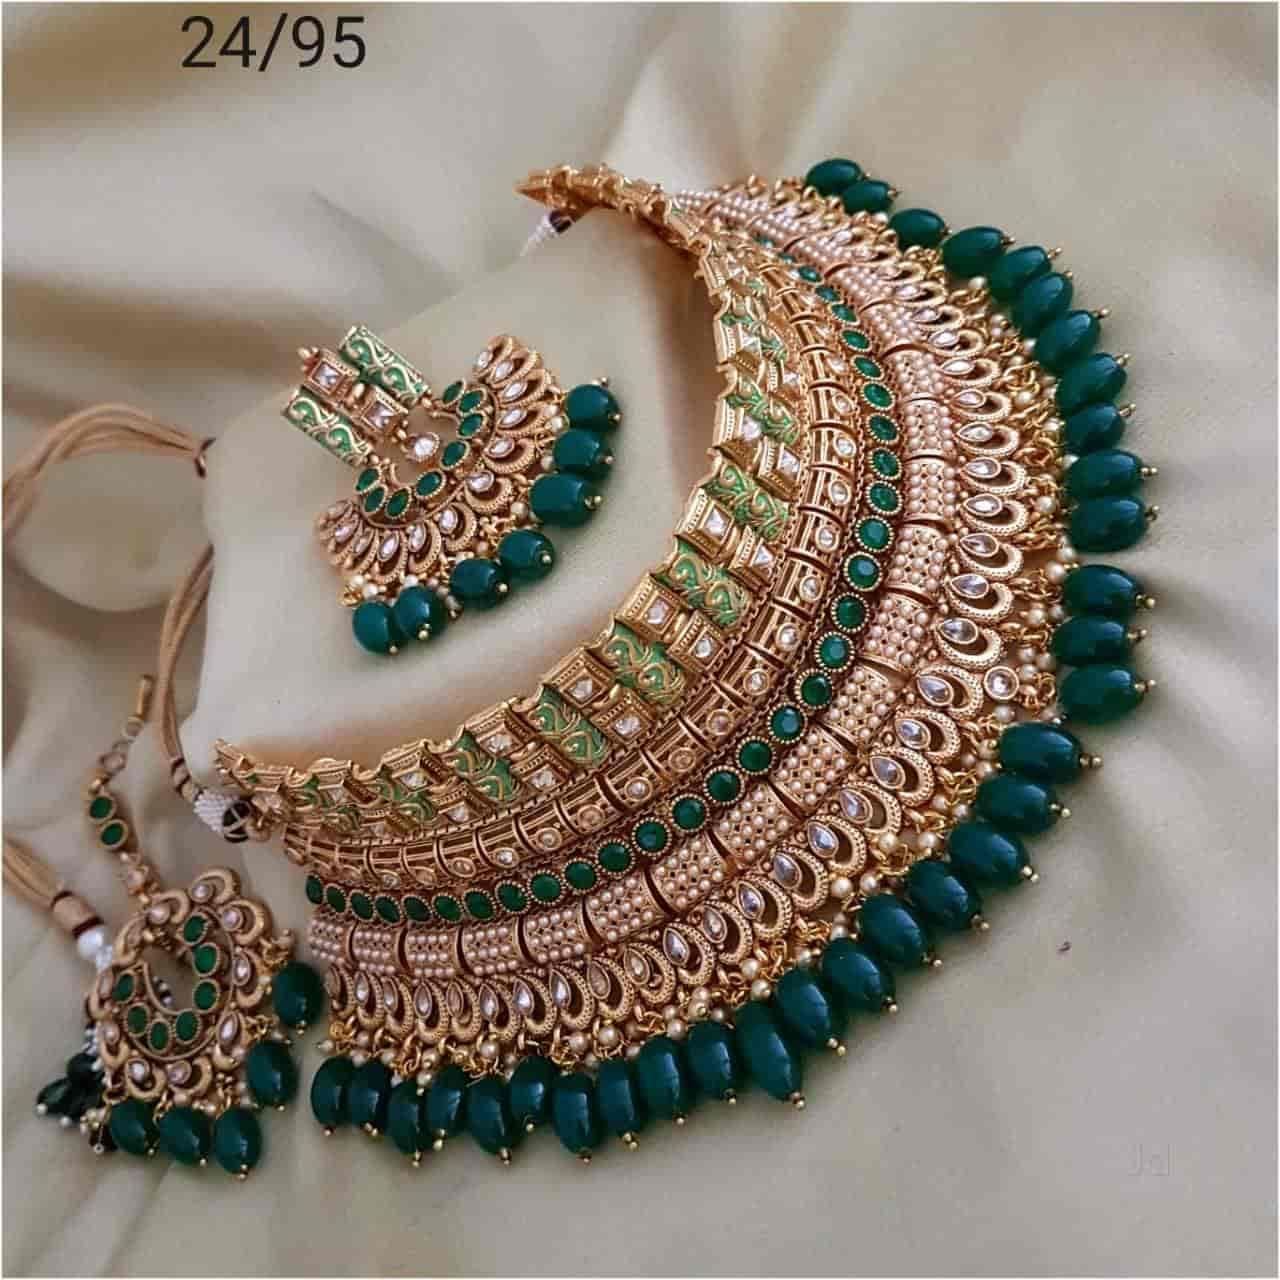 Top 100 Imitation Jewellery Manufacturers In Mumbai इम ट शन ज व लर मन फक चरर स म बई Best Artificial Jewellery Manufacturers Justdial